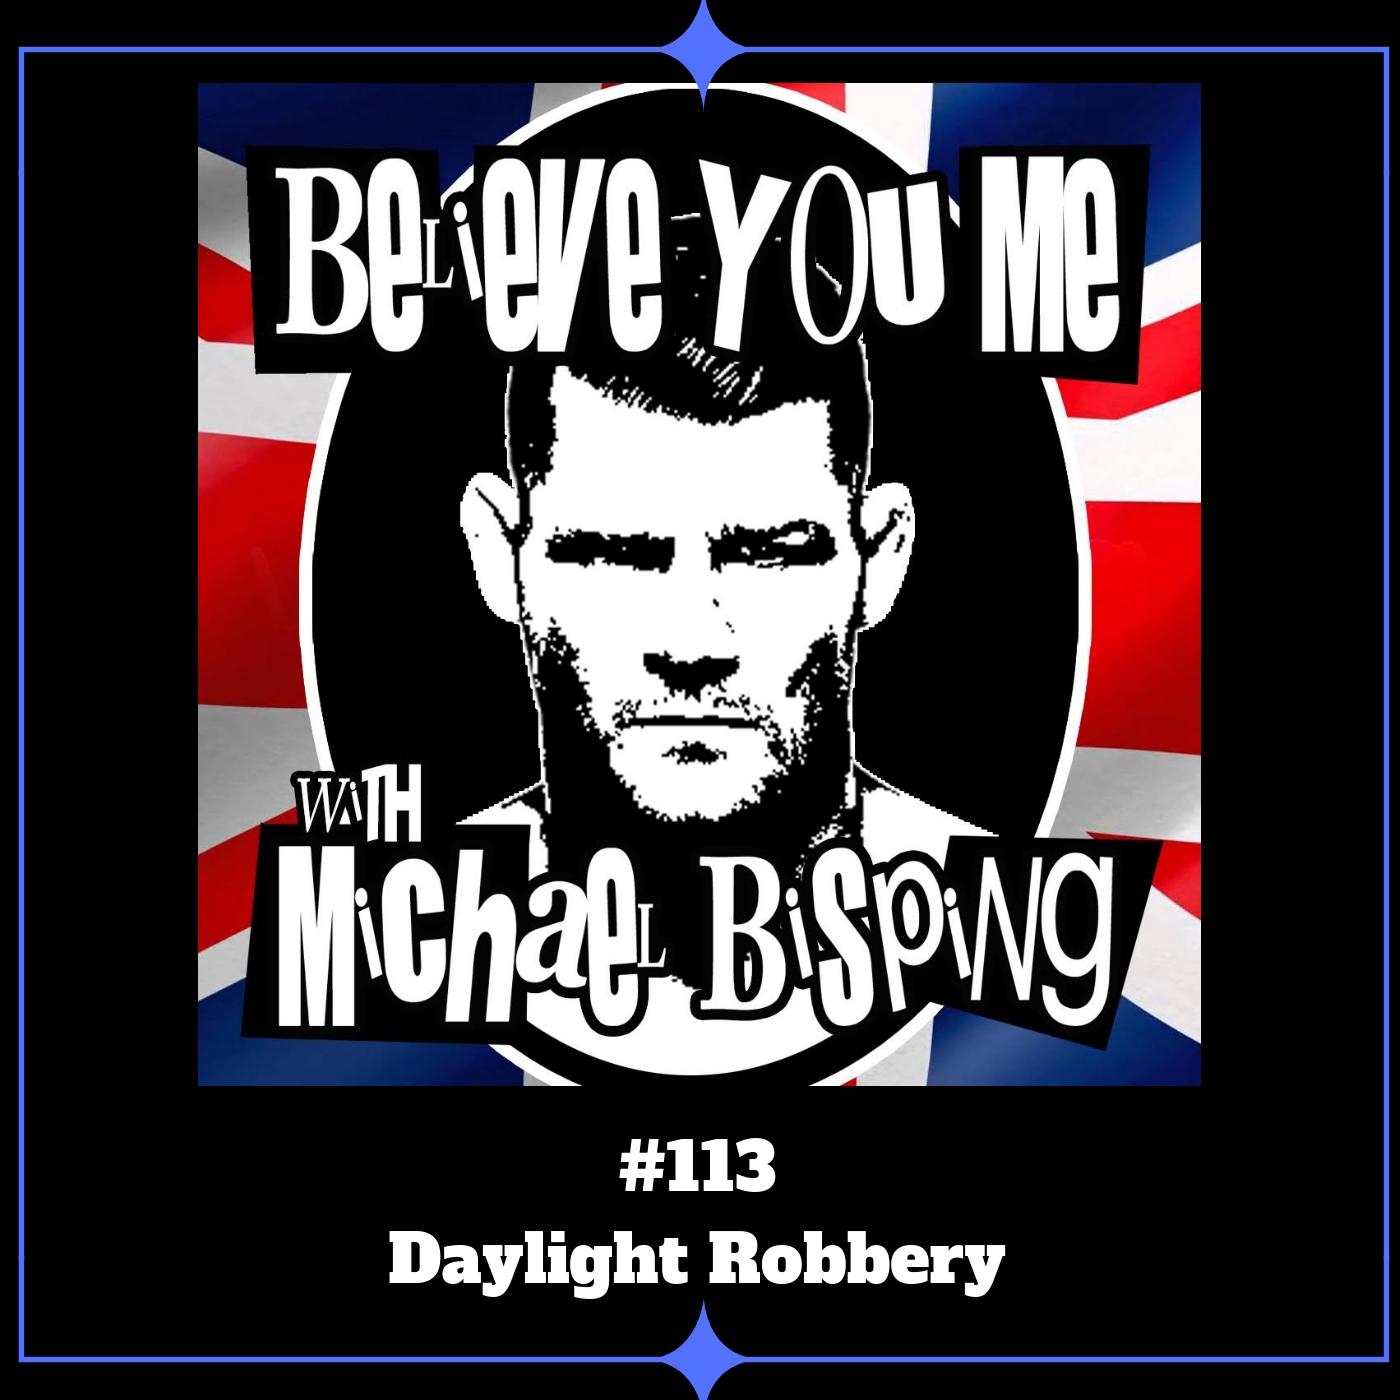 113 - Daytime Robbery